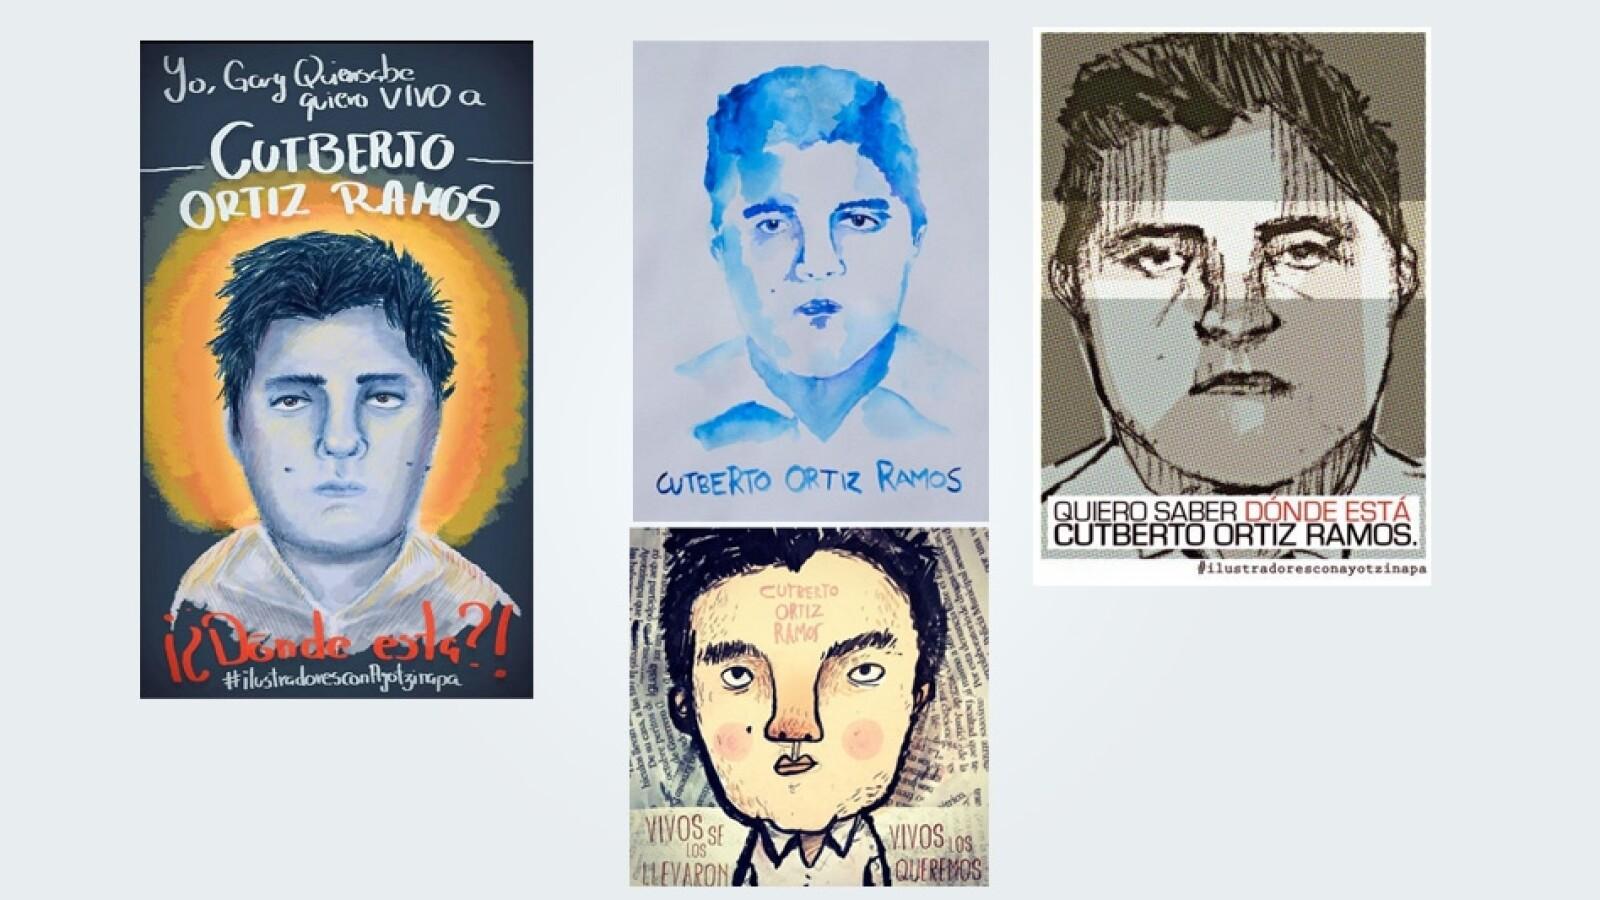 Cutberto Ortiz Ayotzinapa